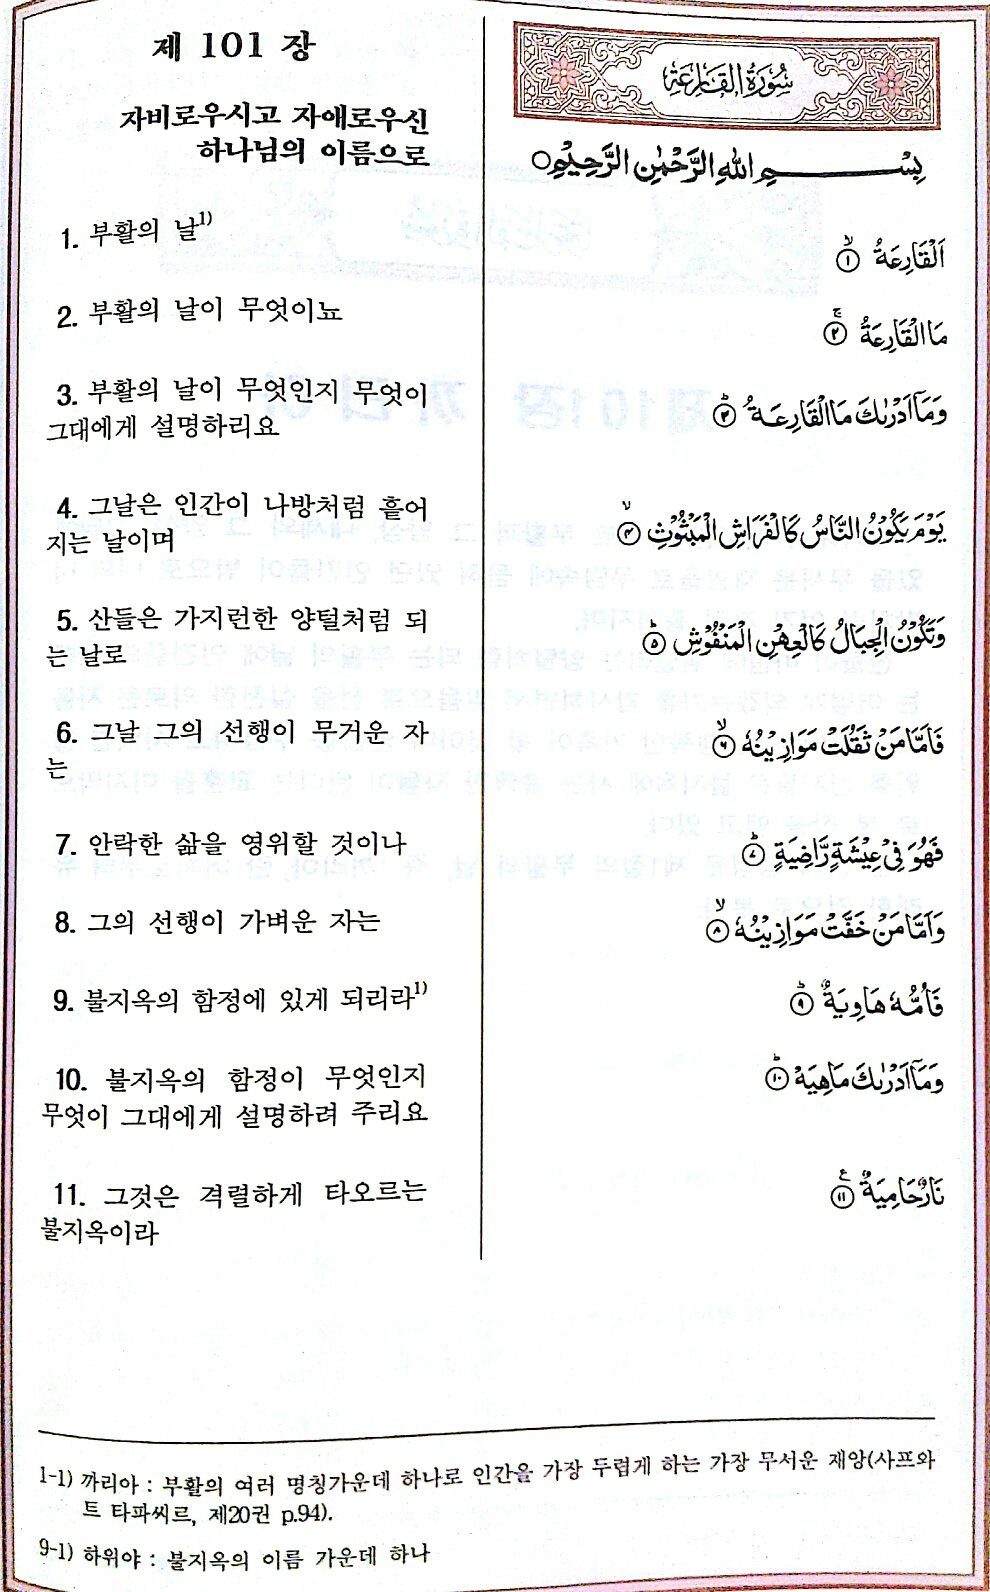 quran_korea_alqoriah